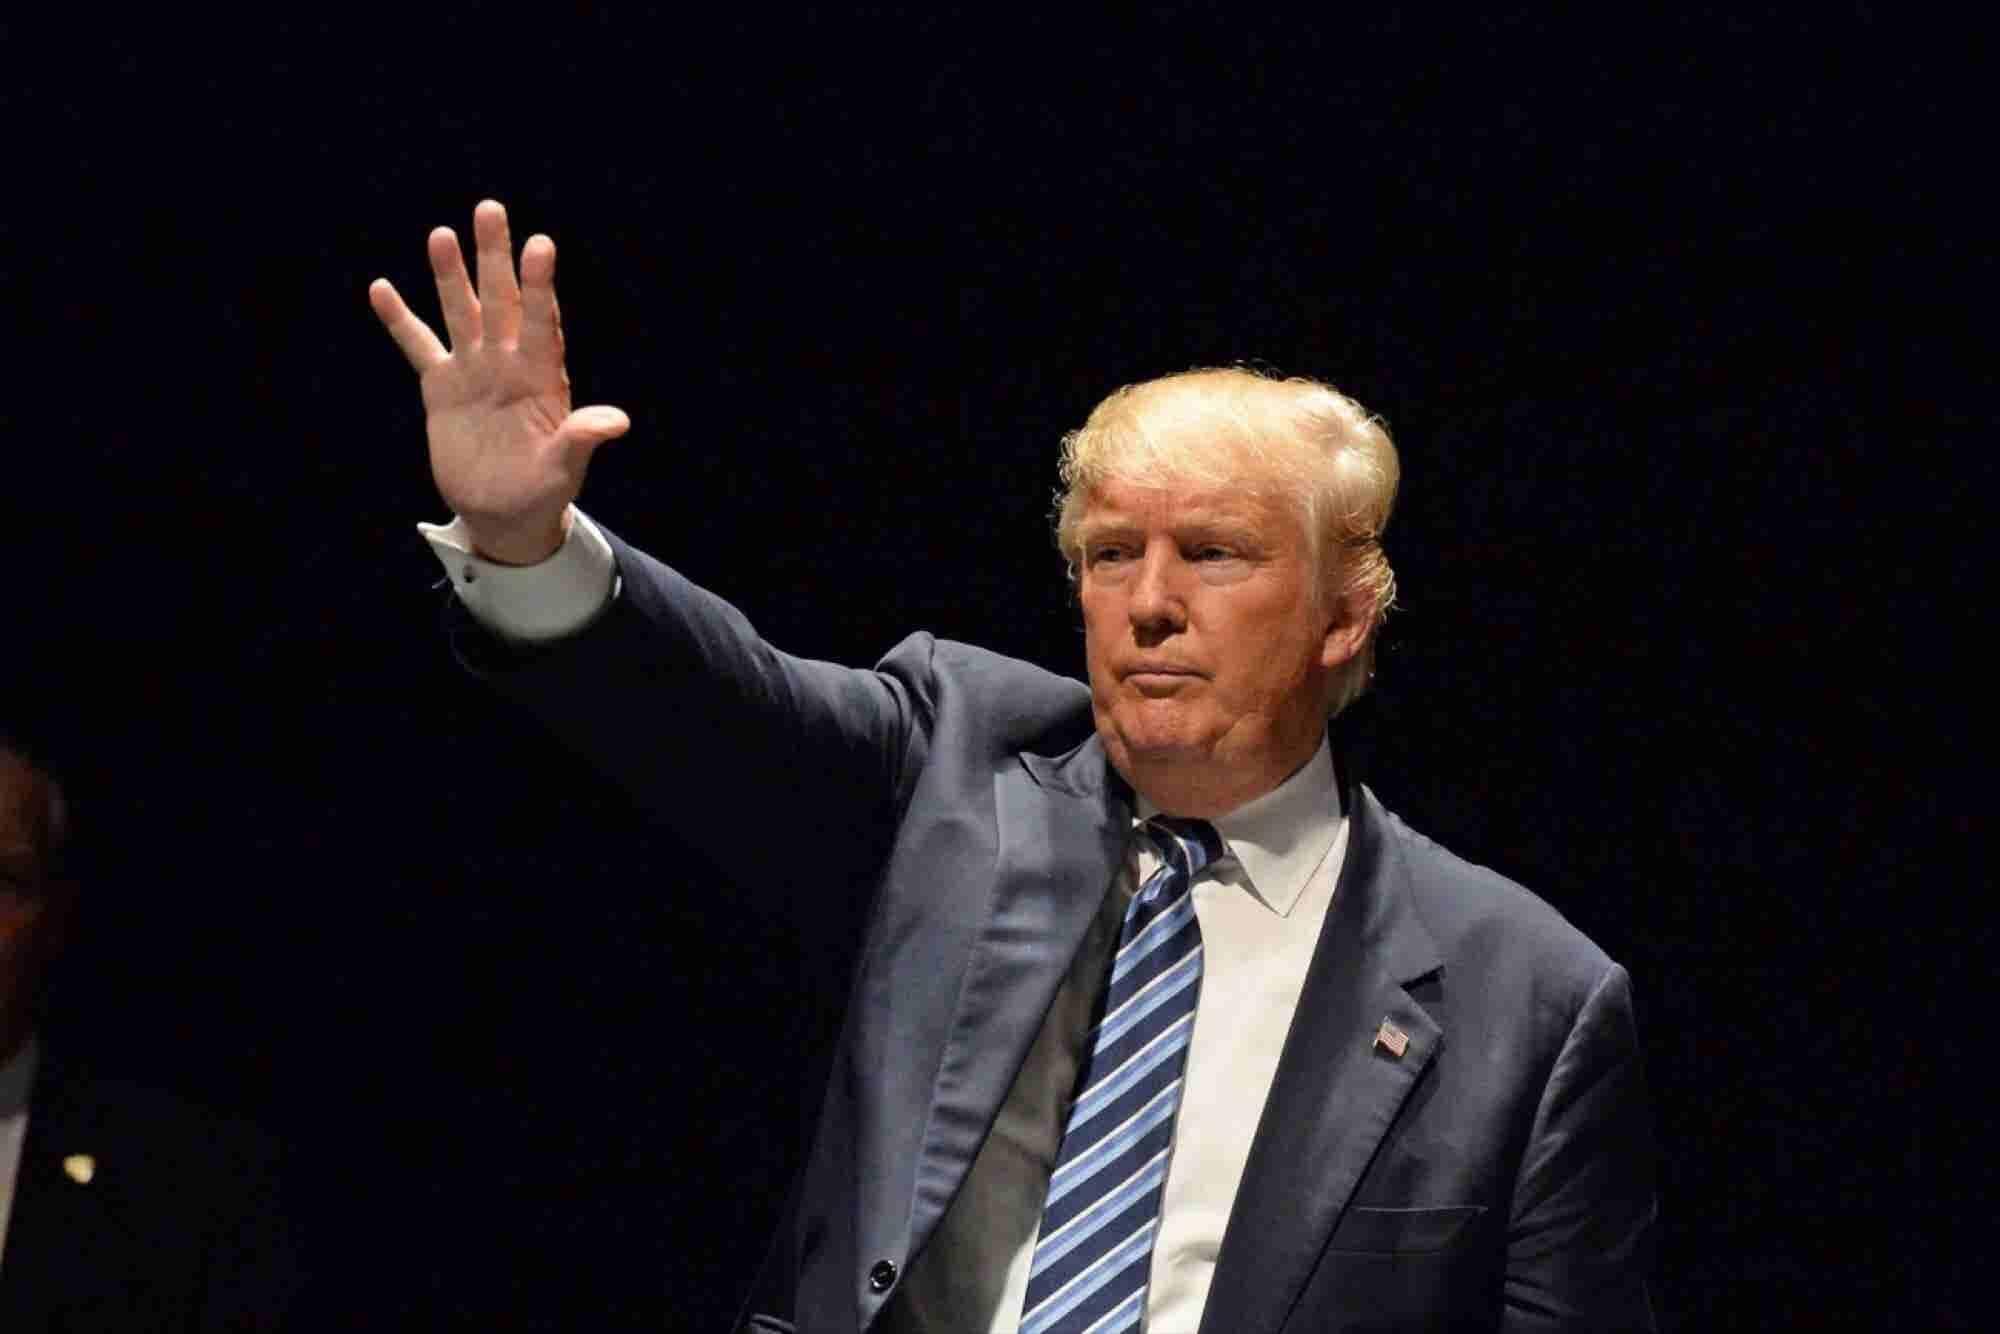 How to Stream Trump's Address to Congress